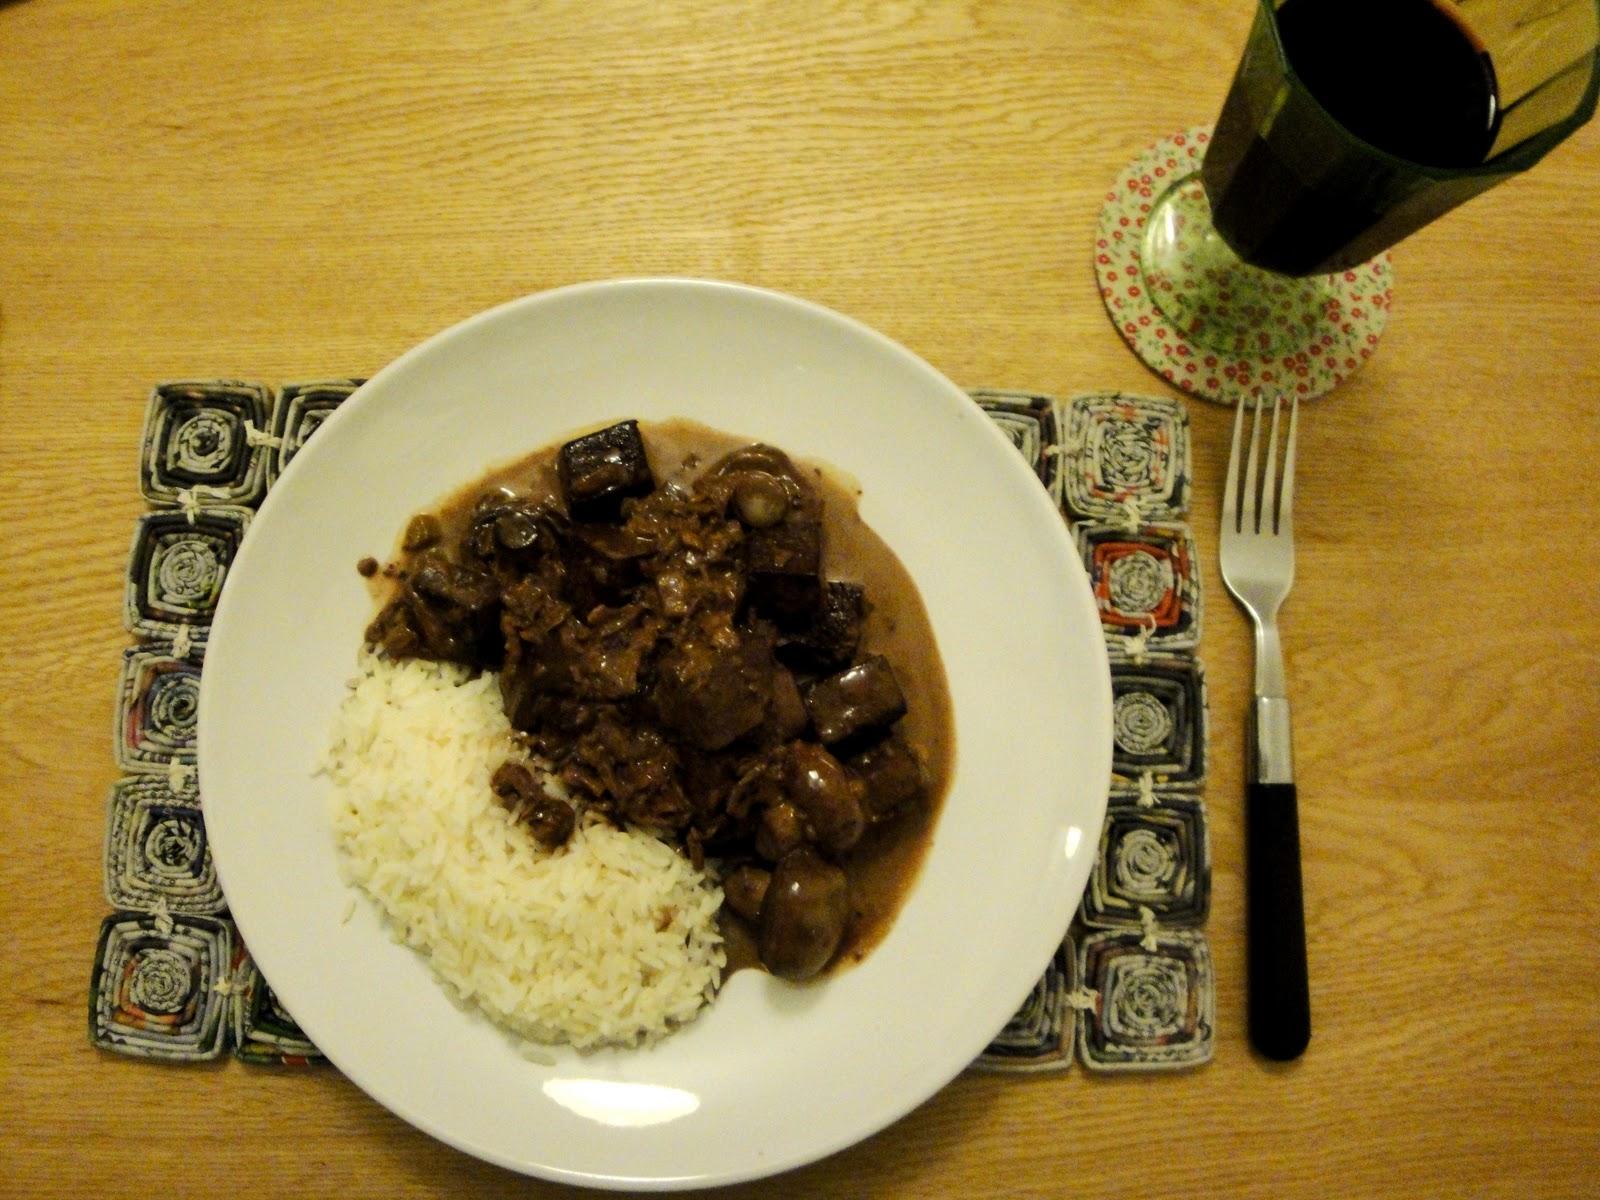 Culinary Conquests: Mushroom and Tofu Stroganoff